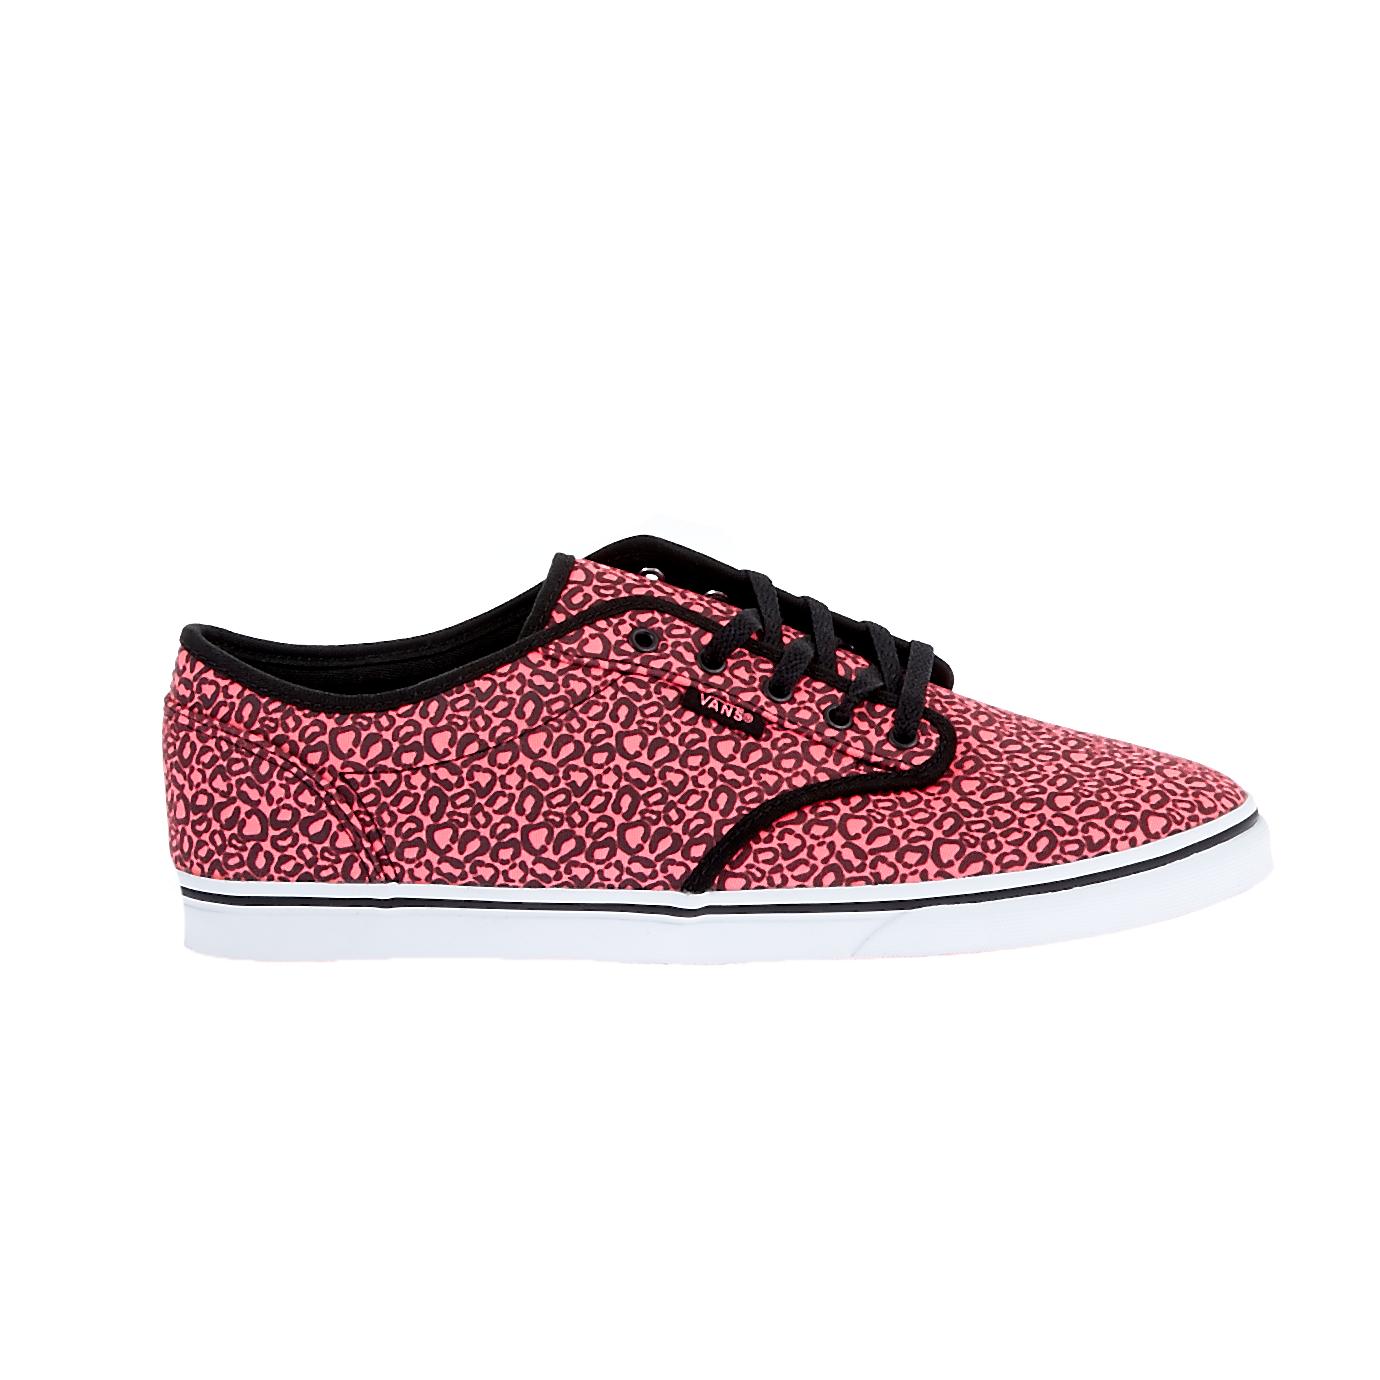 VANS – Γυναικεία παπούτσια VANS φούξια